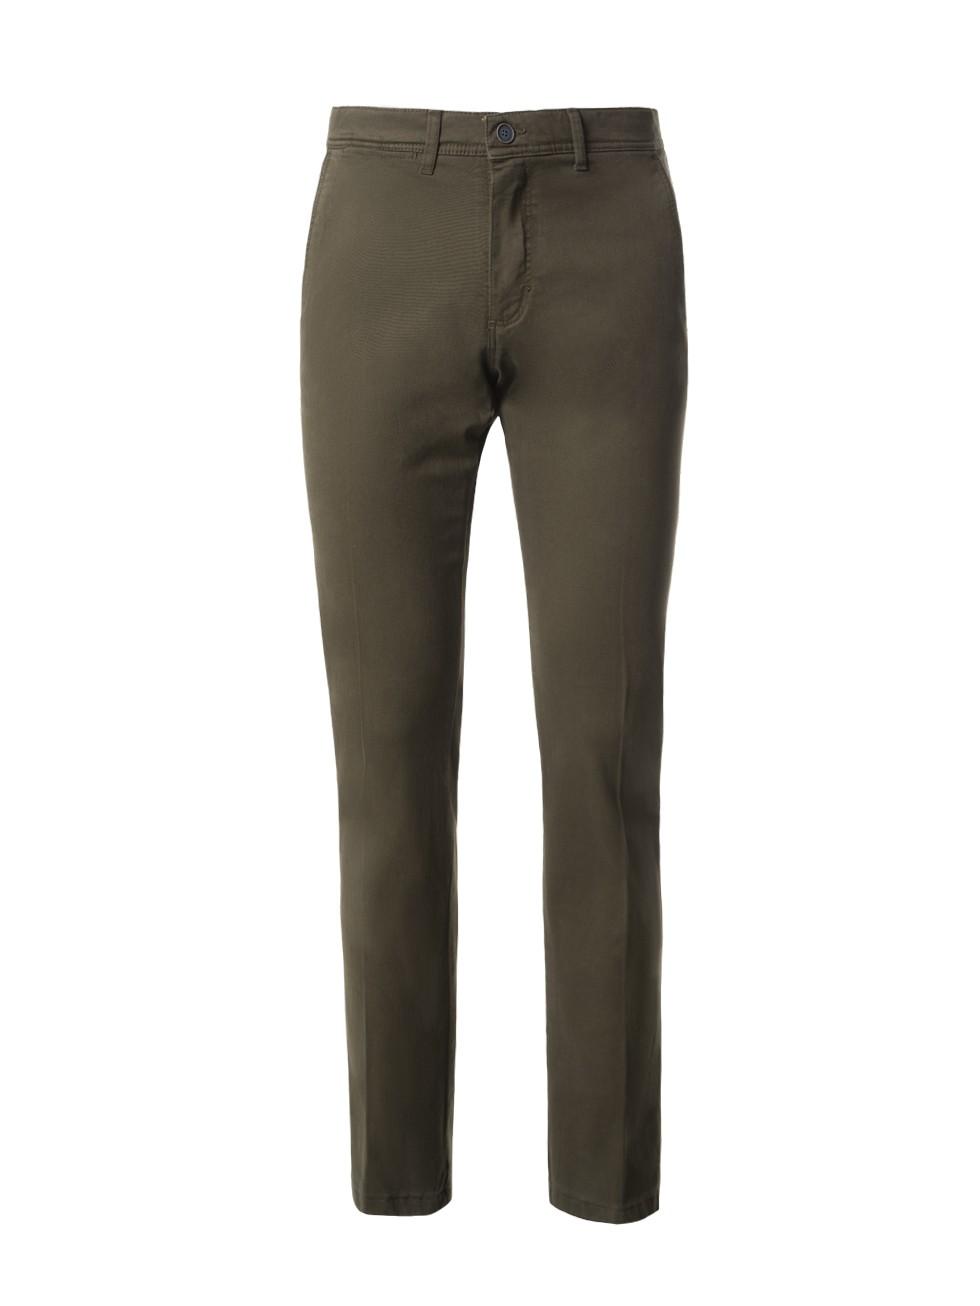 Pantalón chino khaki